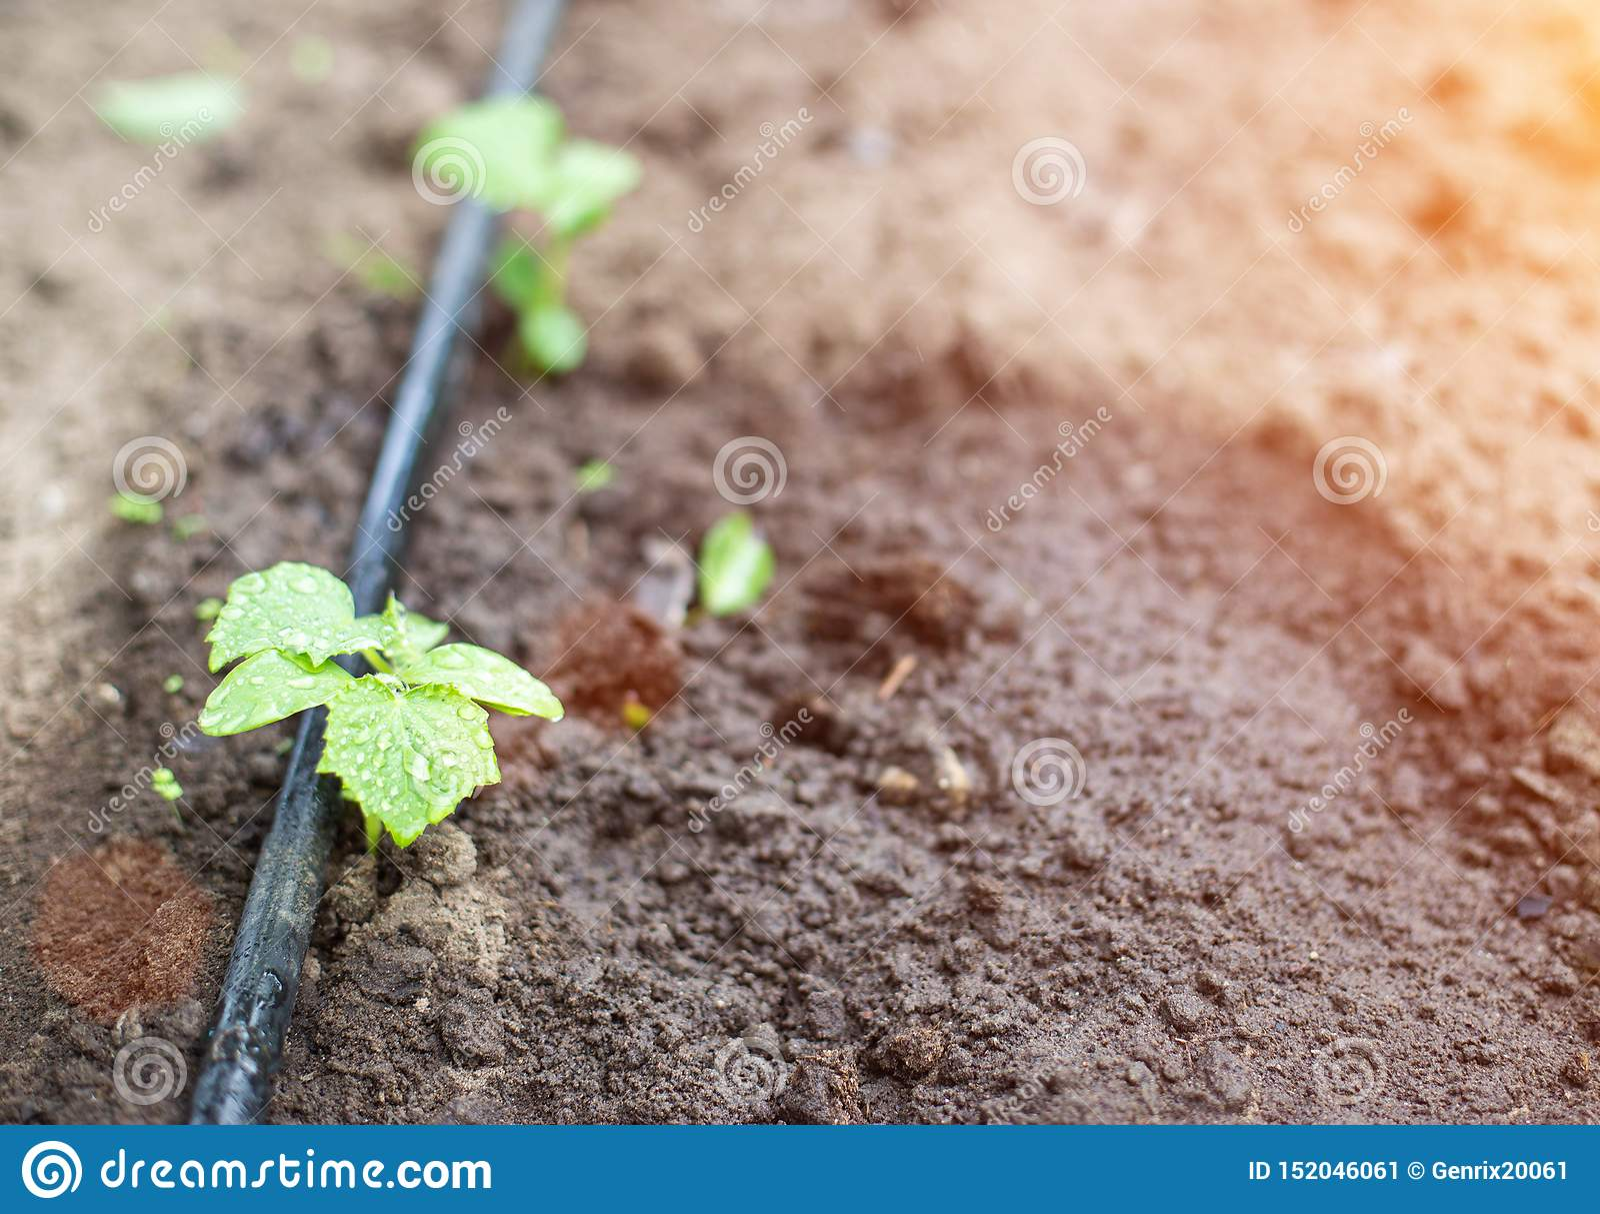 Plants Get Water Using Modern Irrigation System Drip